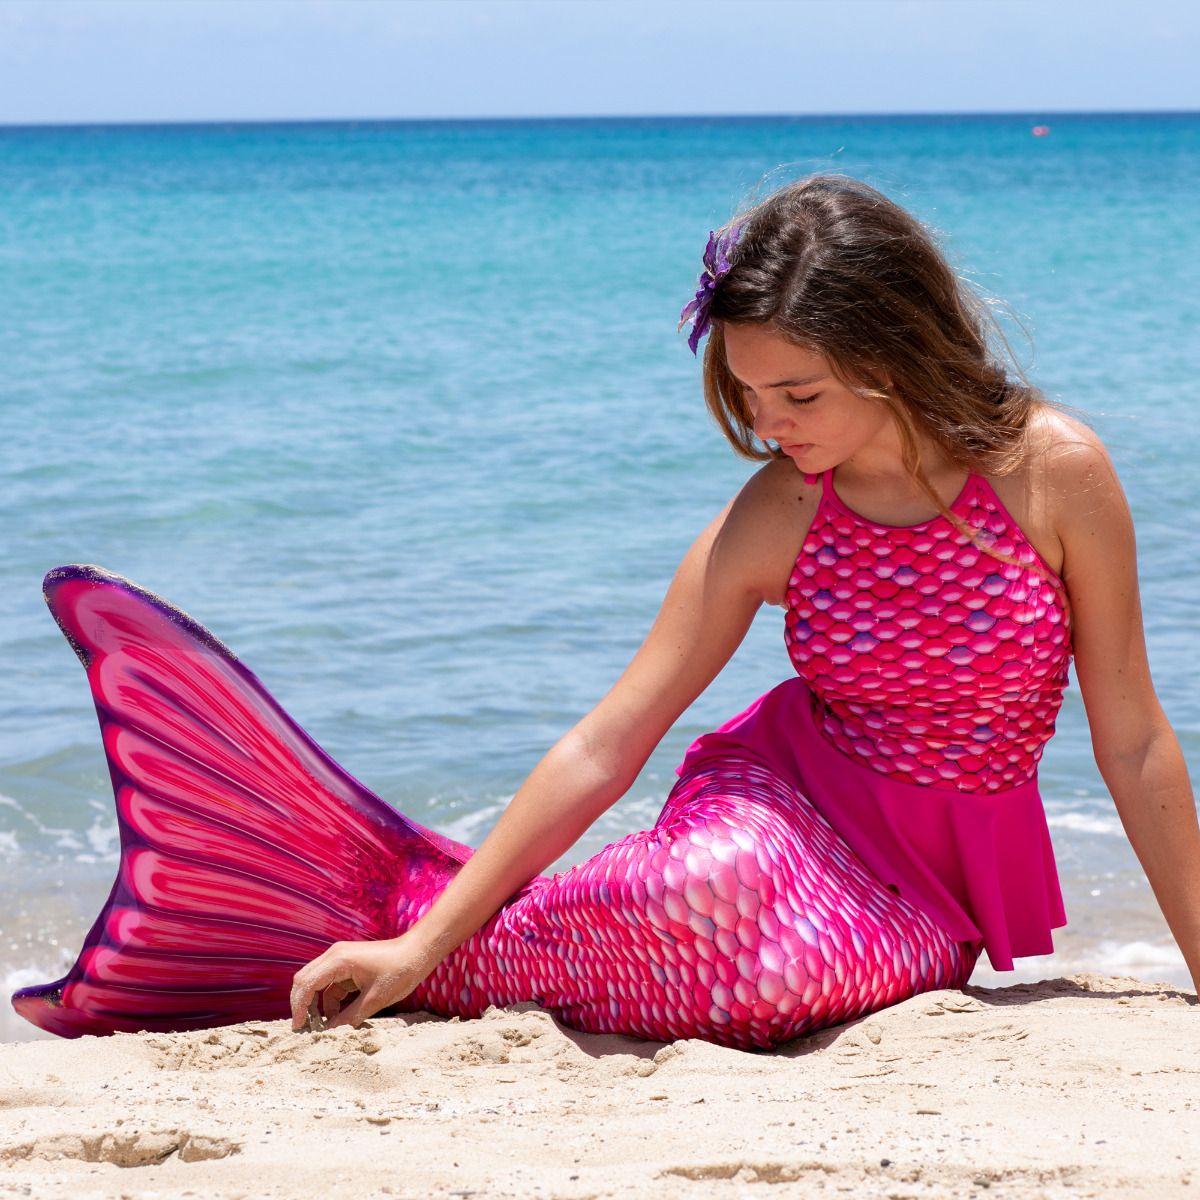 1d904158e3e3f Malibu Pink Peplum Tankini Top for Girls and Women by Fin Fun